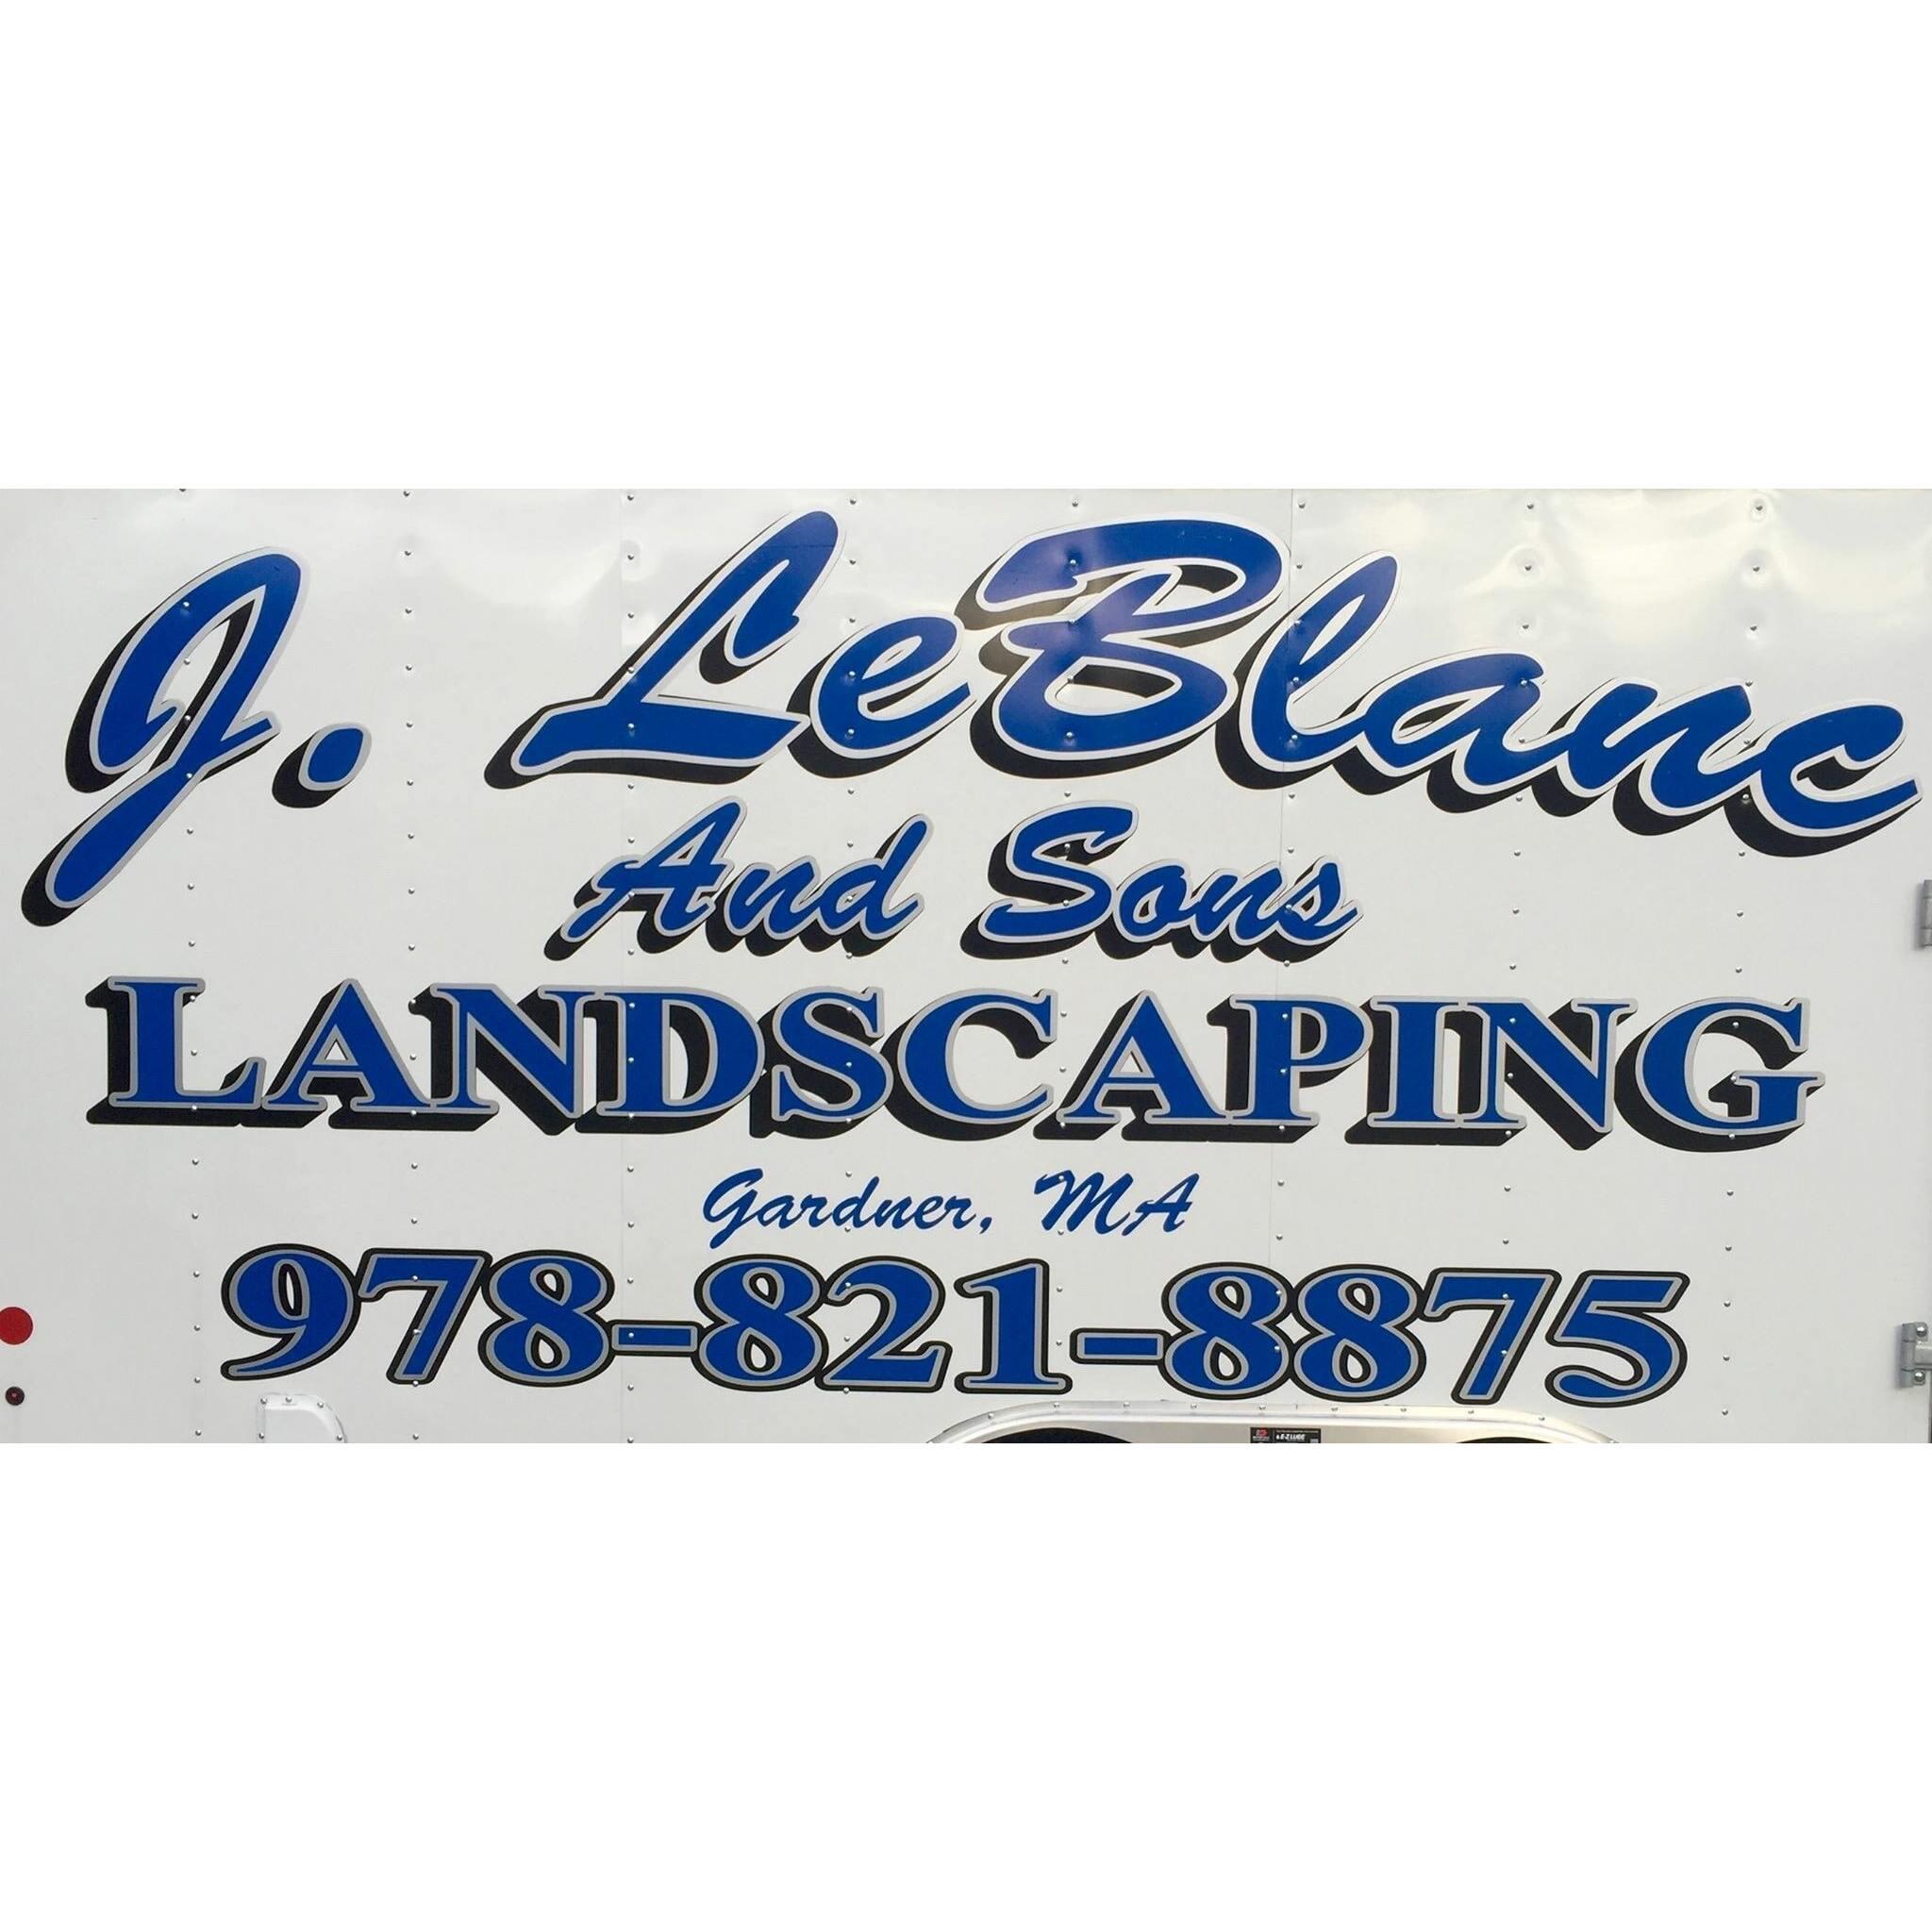 J. LeBlanc and Sons Landscaping Logo